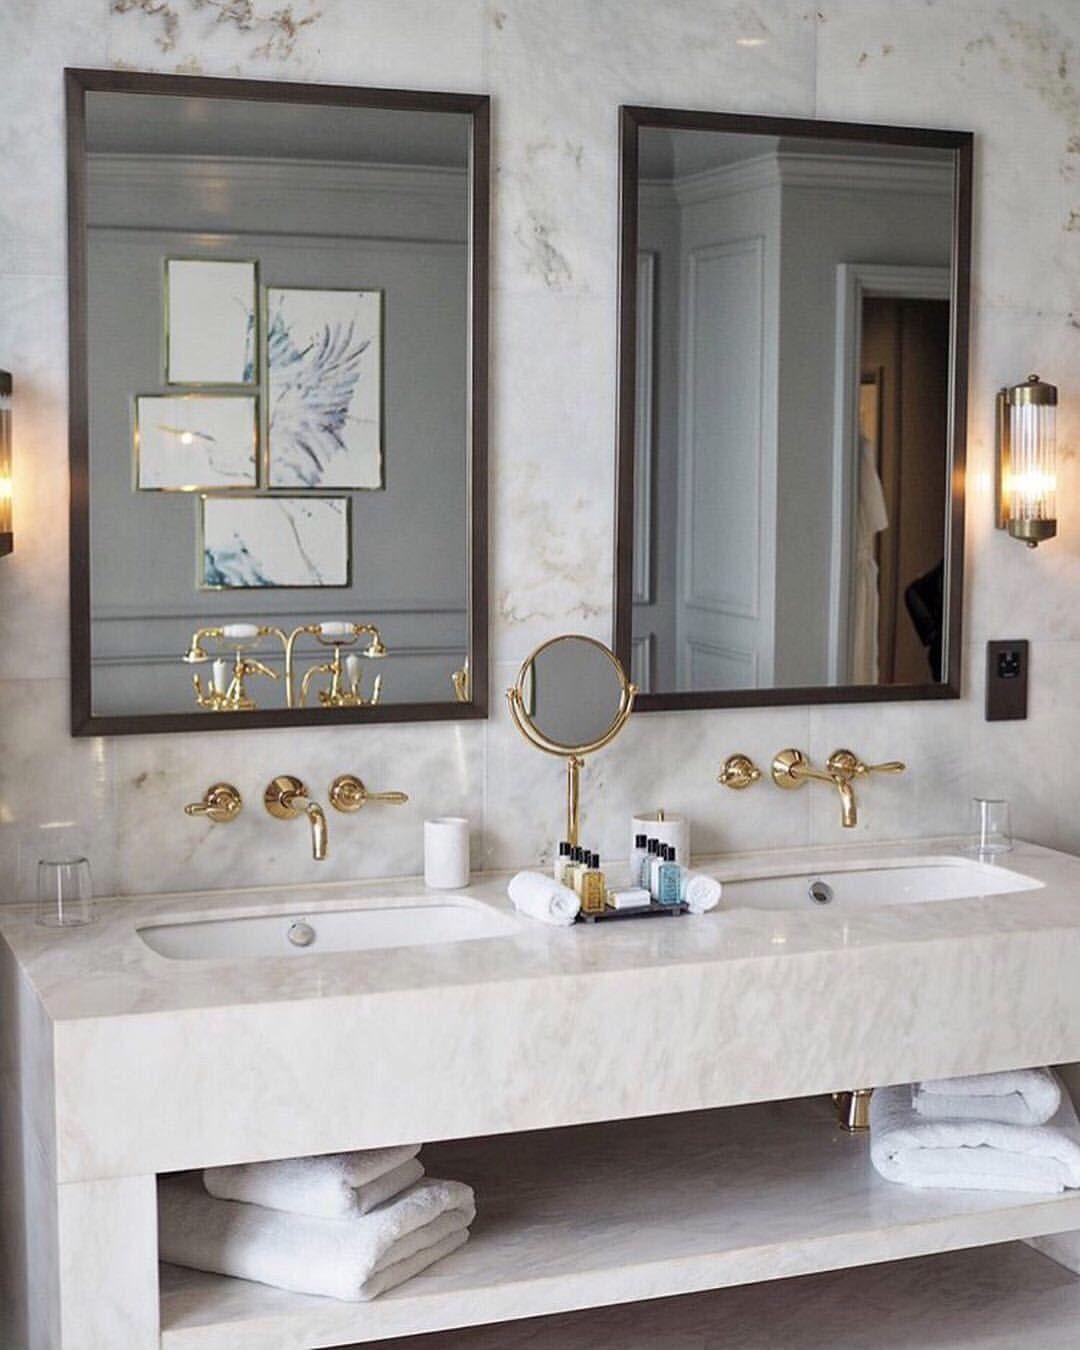 Elle Decor On Instagram Bathroom Goals Regram Fashionfoiegras At Lympstone Manor Interior Design Toilet Best Bathroom Designs Home Room Design Elle decor best bathrooms